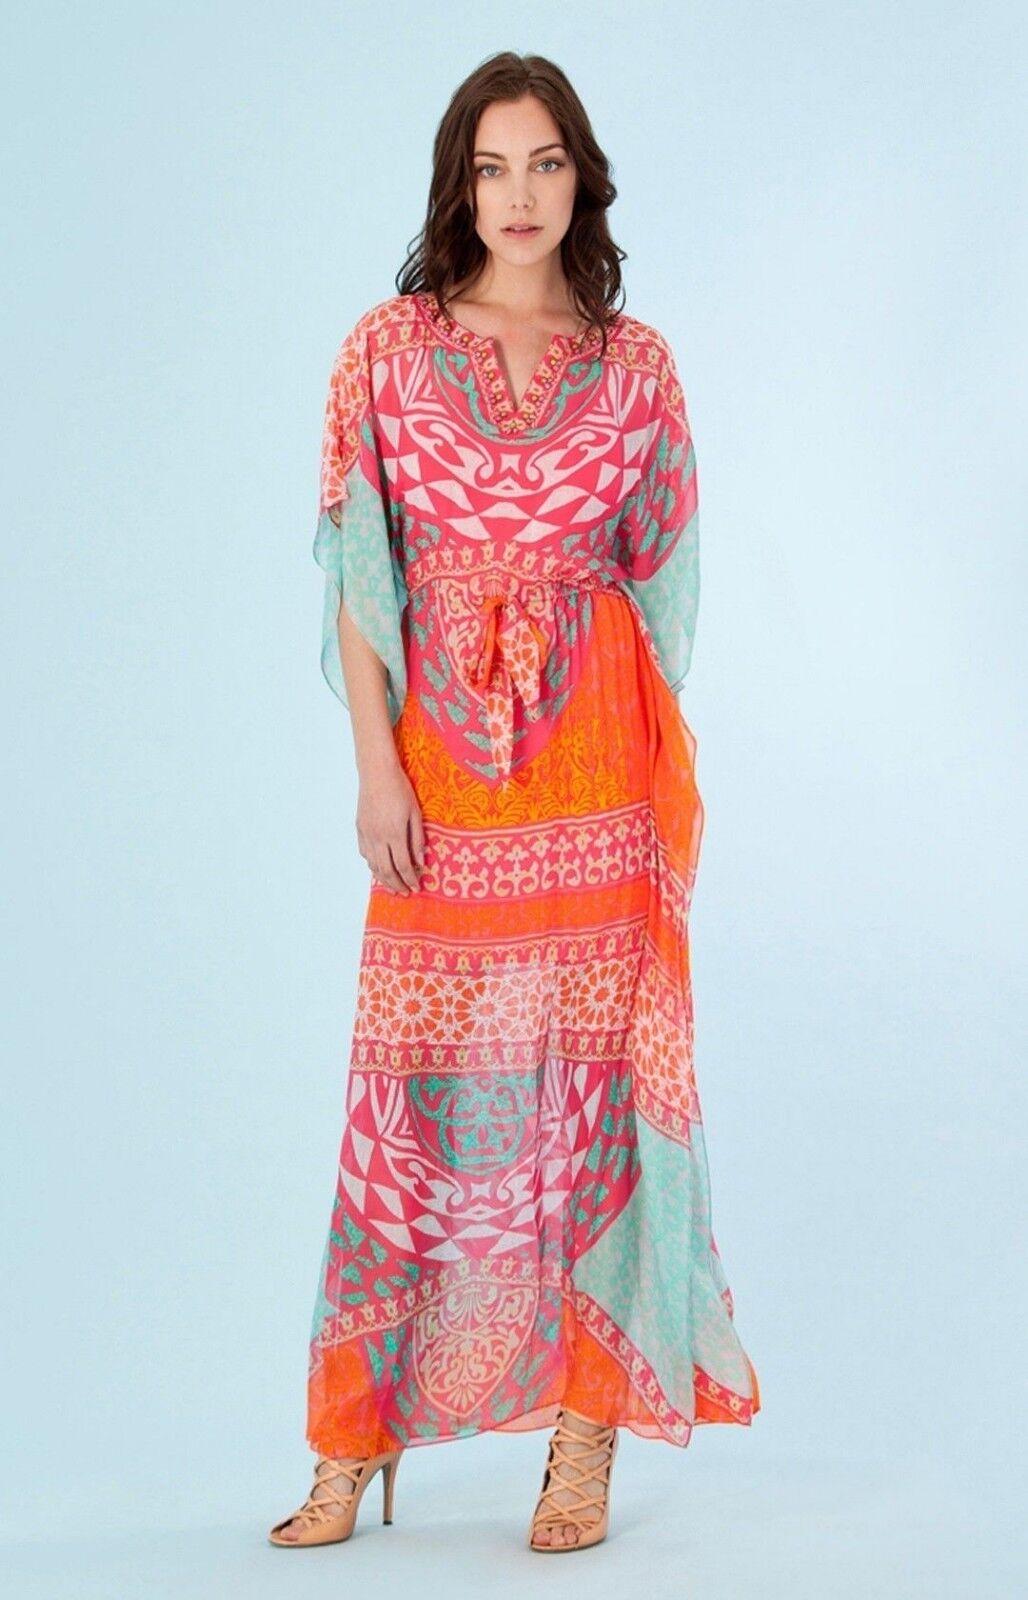 868b02a875c NWT Hale Bob Multi color SILK Long Kaftan Dress 6RTW6975-fuchsia ...